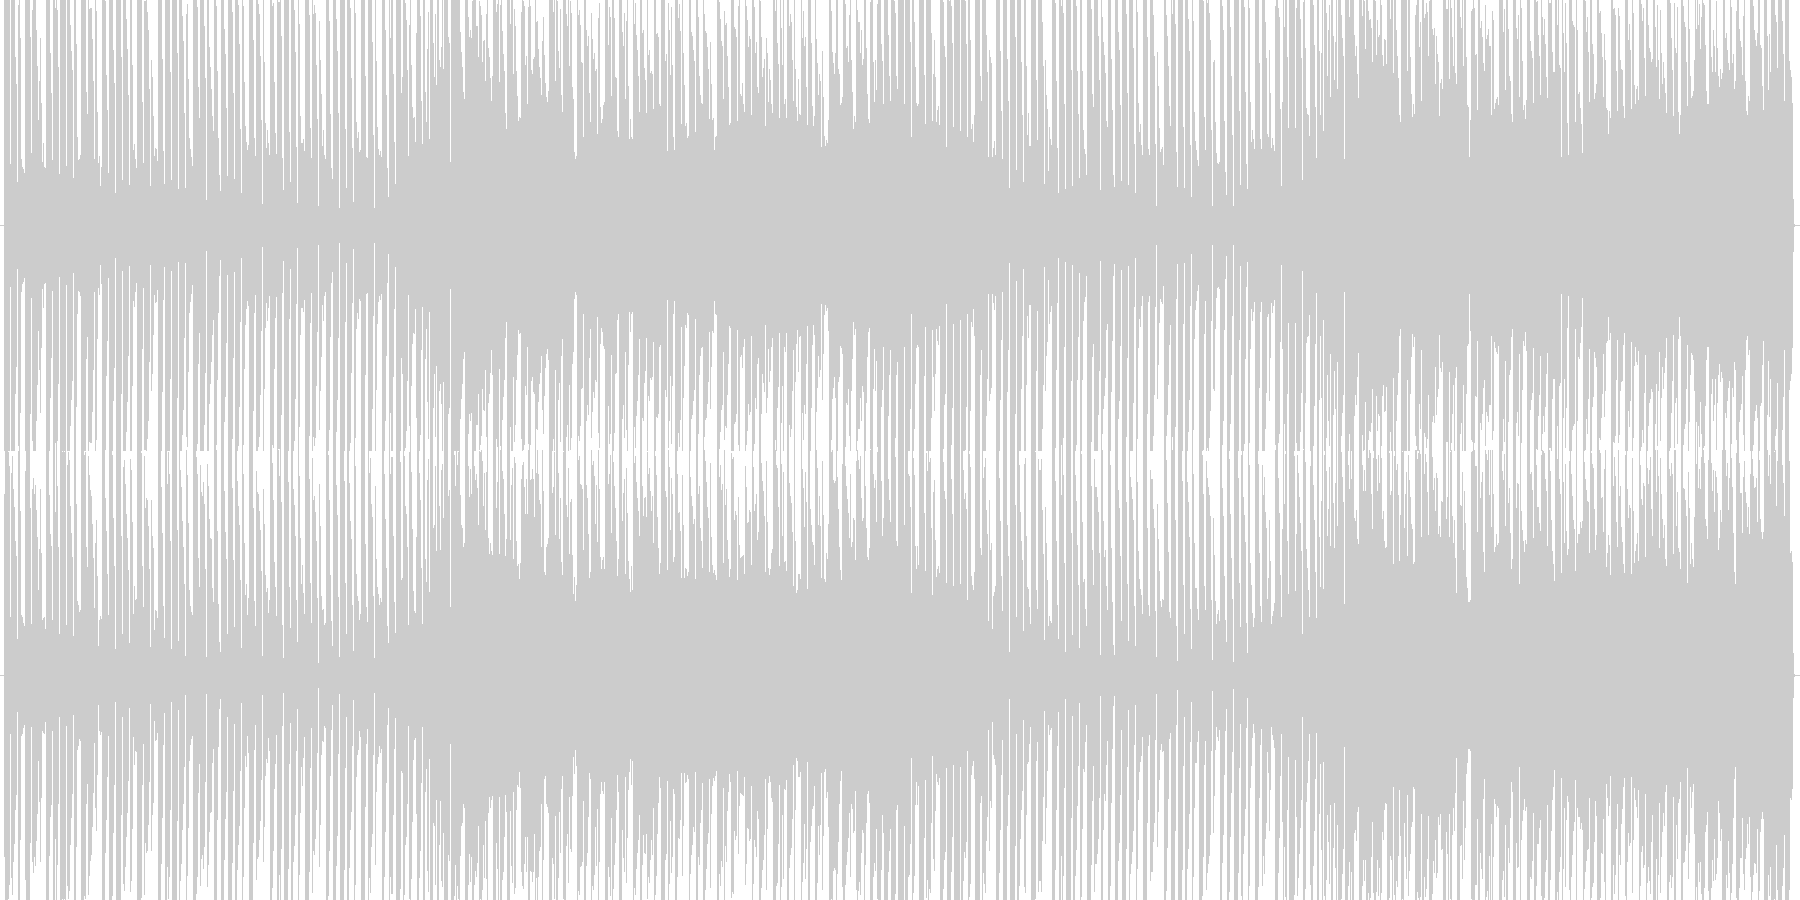 SF的でデジタル感のあるテクノトランスの未再生の波形